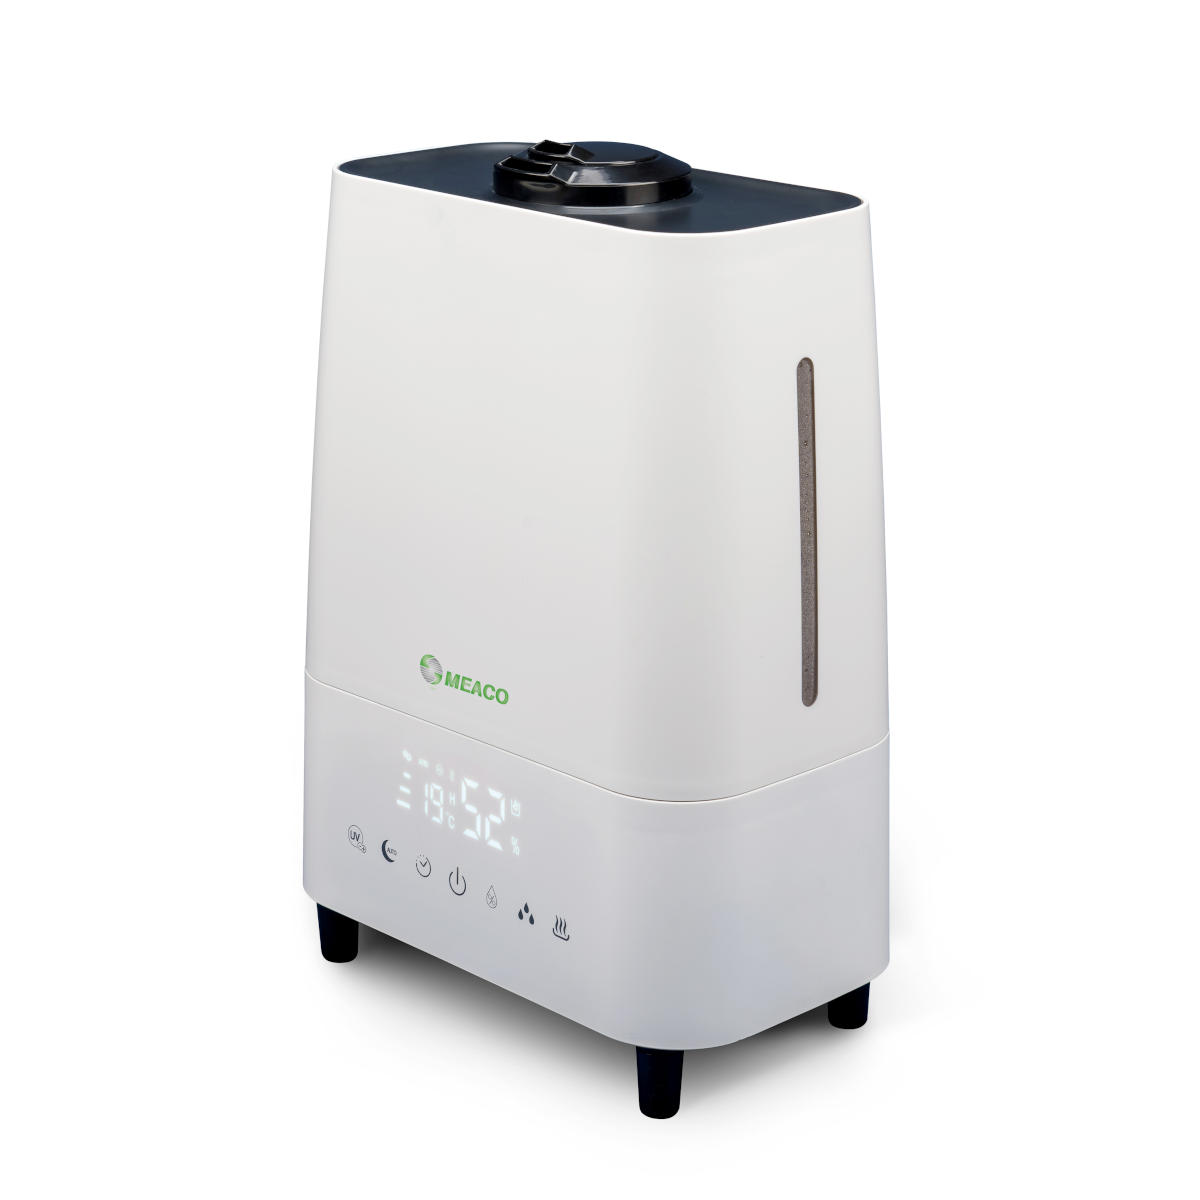 MEACO Deluxe 202 Luftbefeuchter